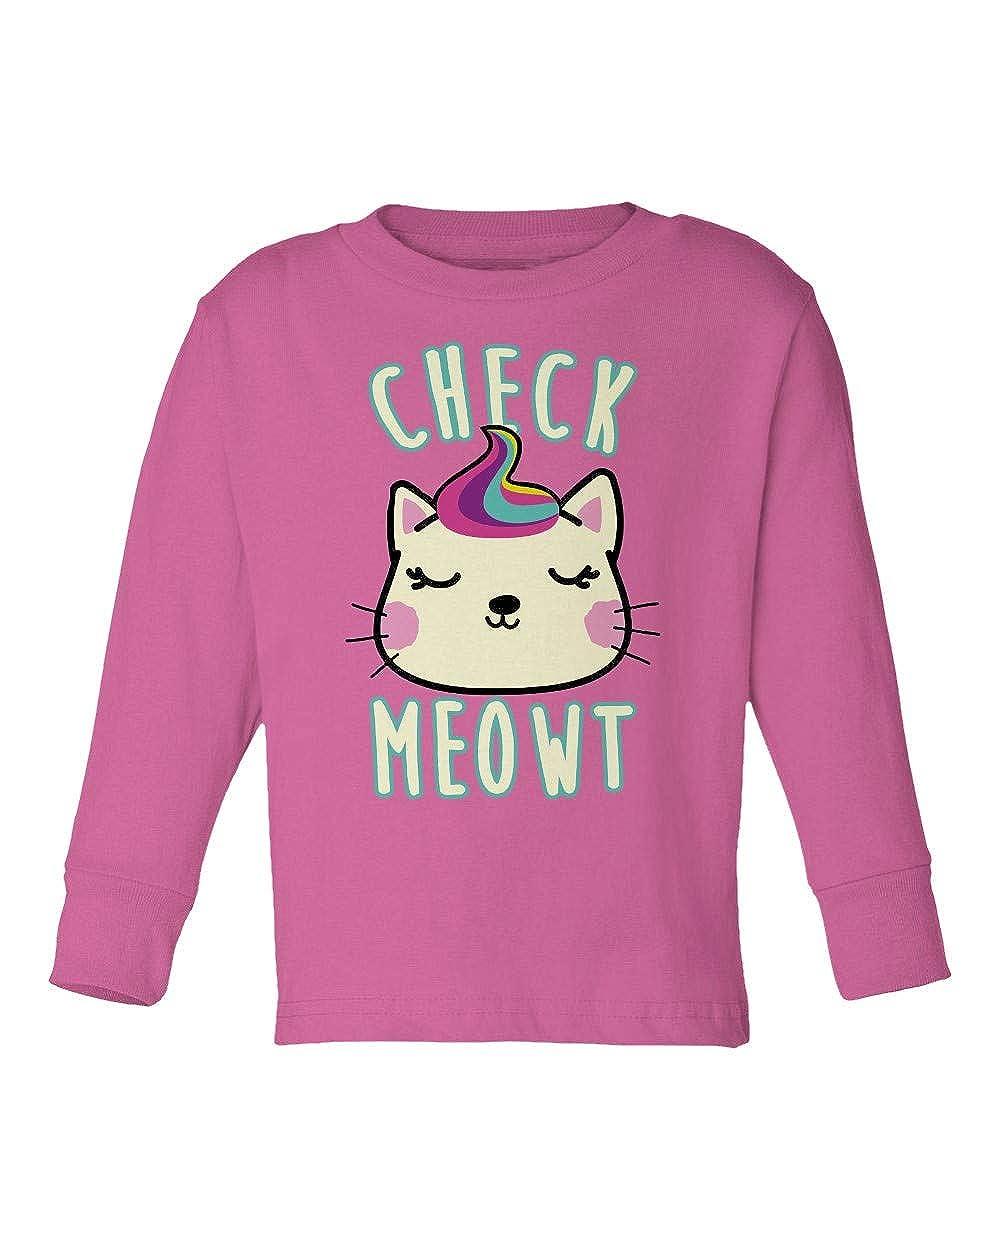 Societee Check Me Out Cute Ironic Check Meowt Cat Kitten Girls Boys Toddler Long Sleeve T-Shirt